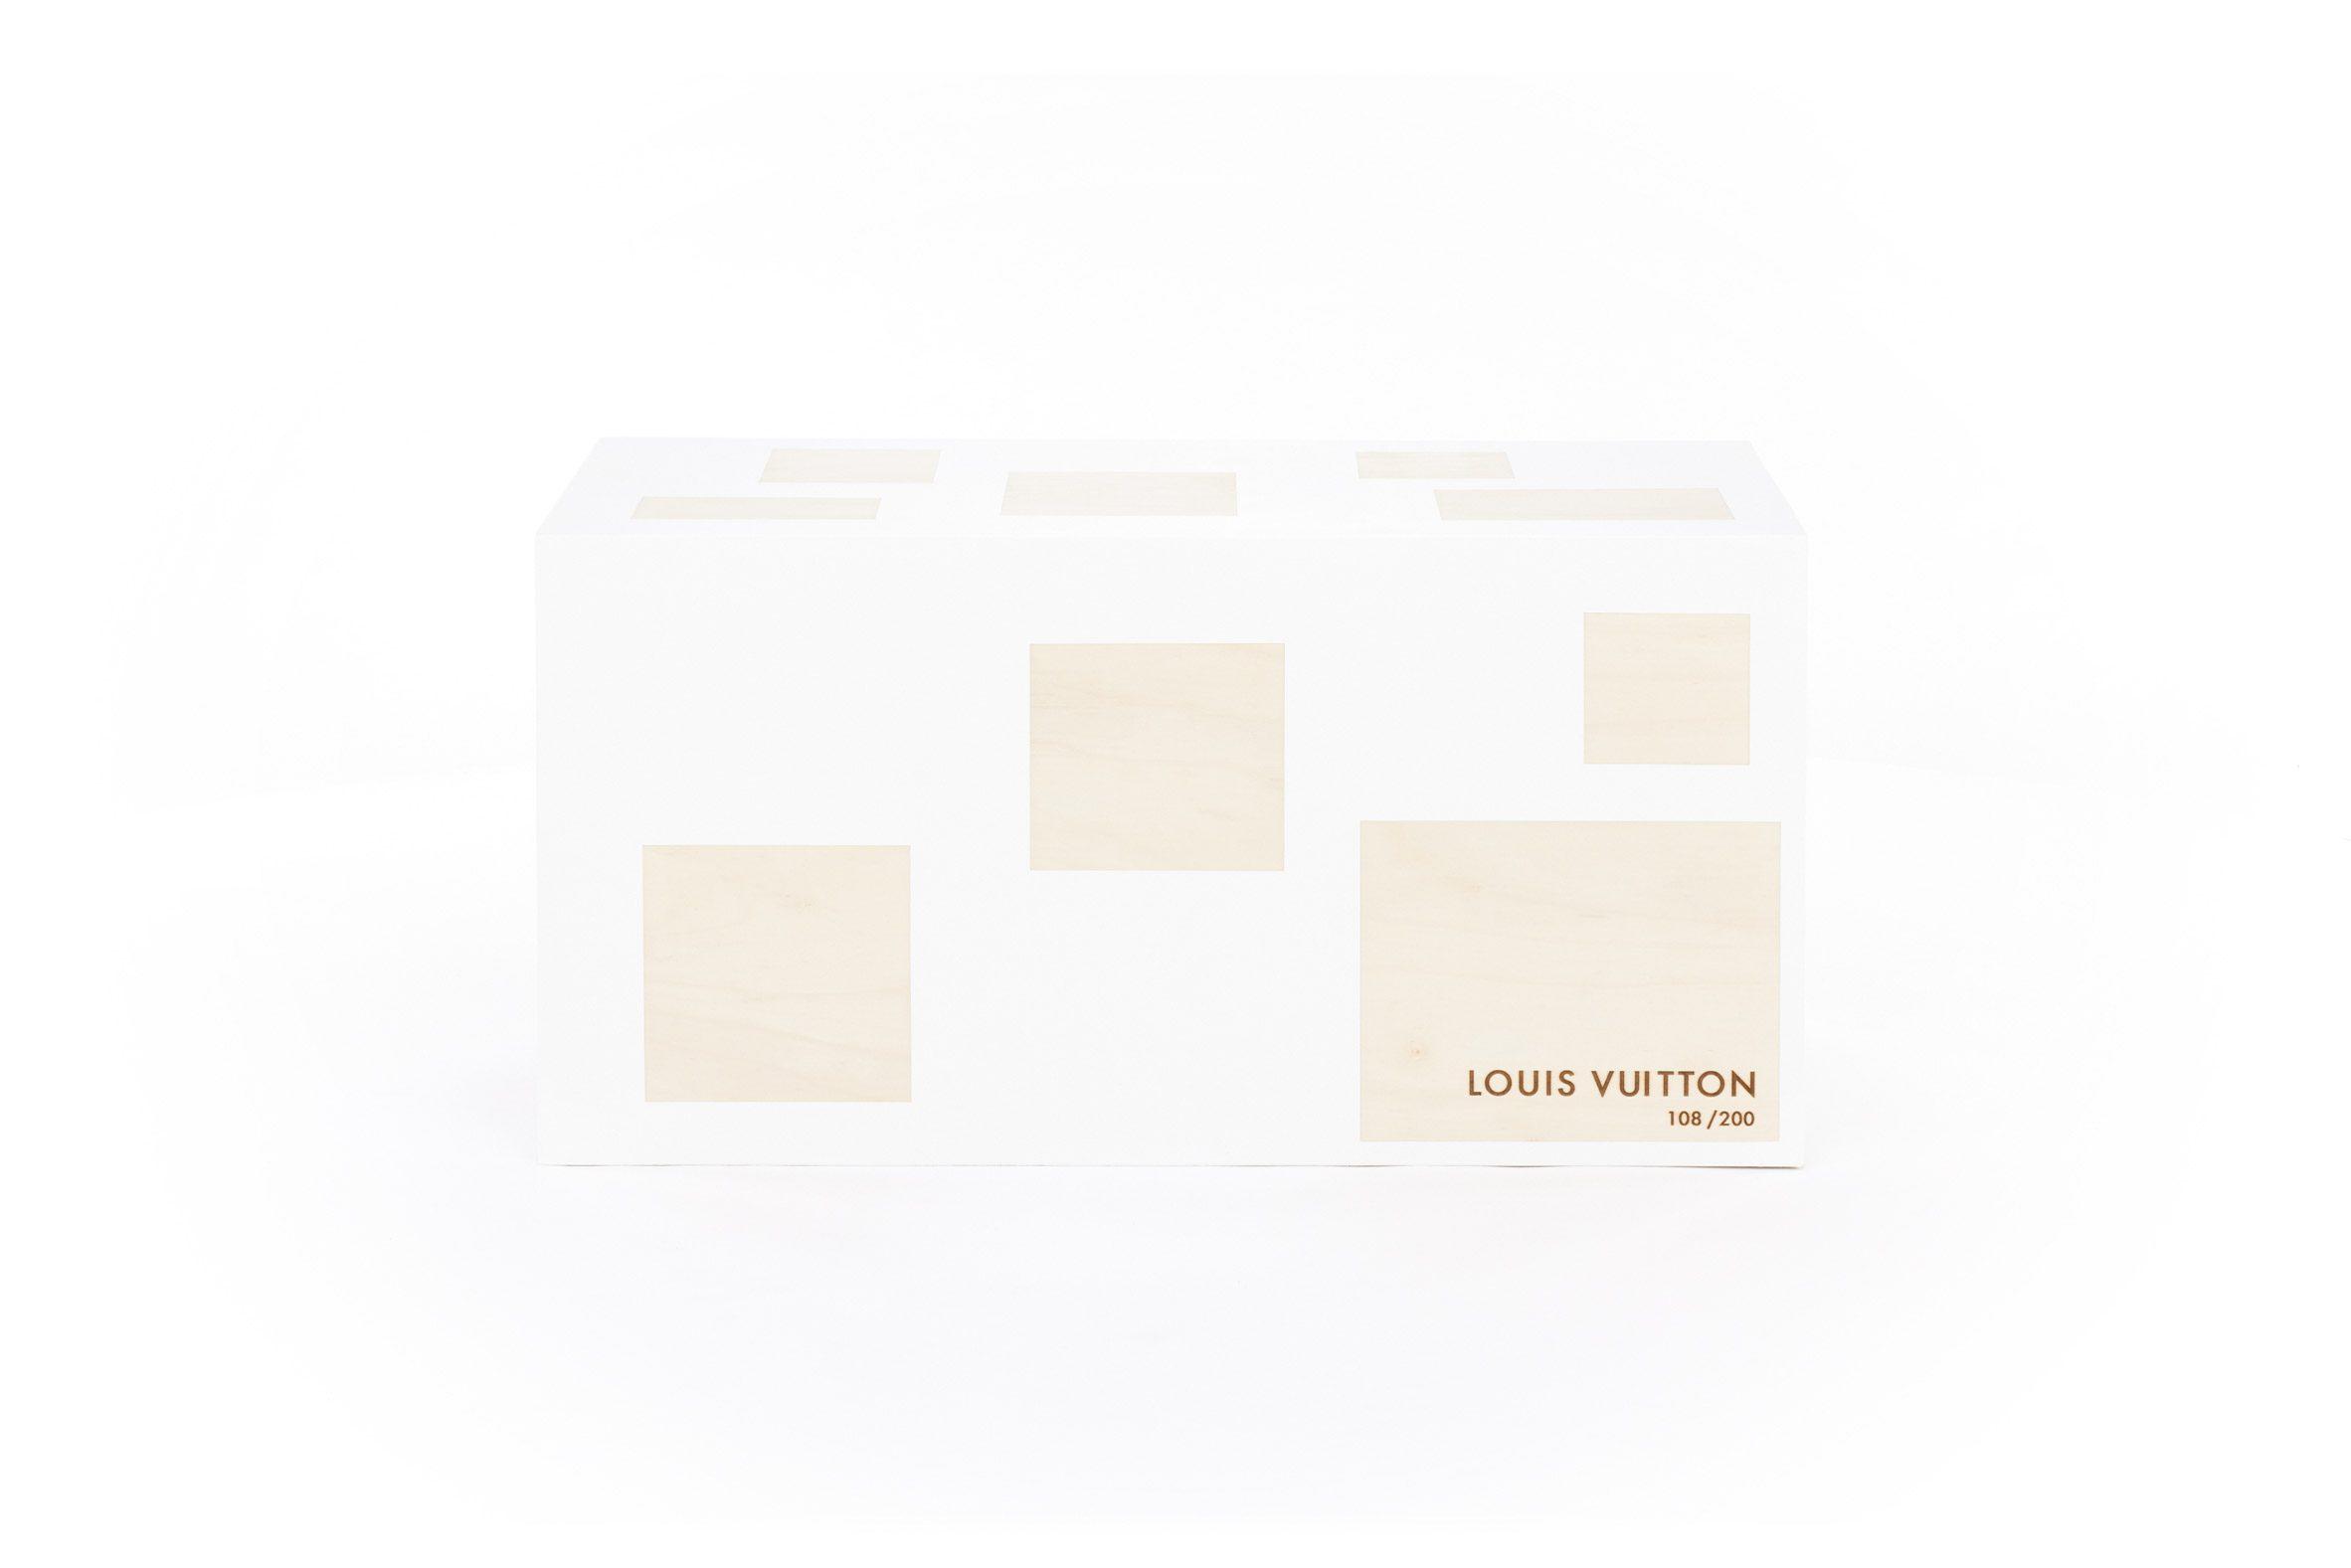 Sou Fujimoto's white trunk design for Louis Vuitton